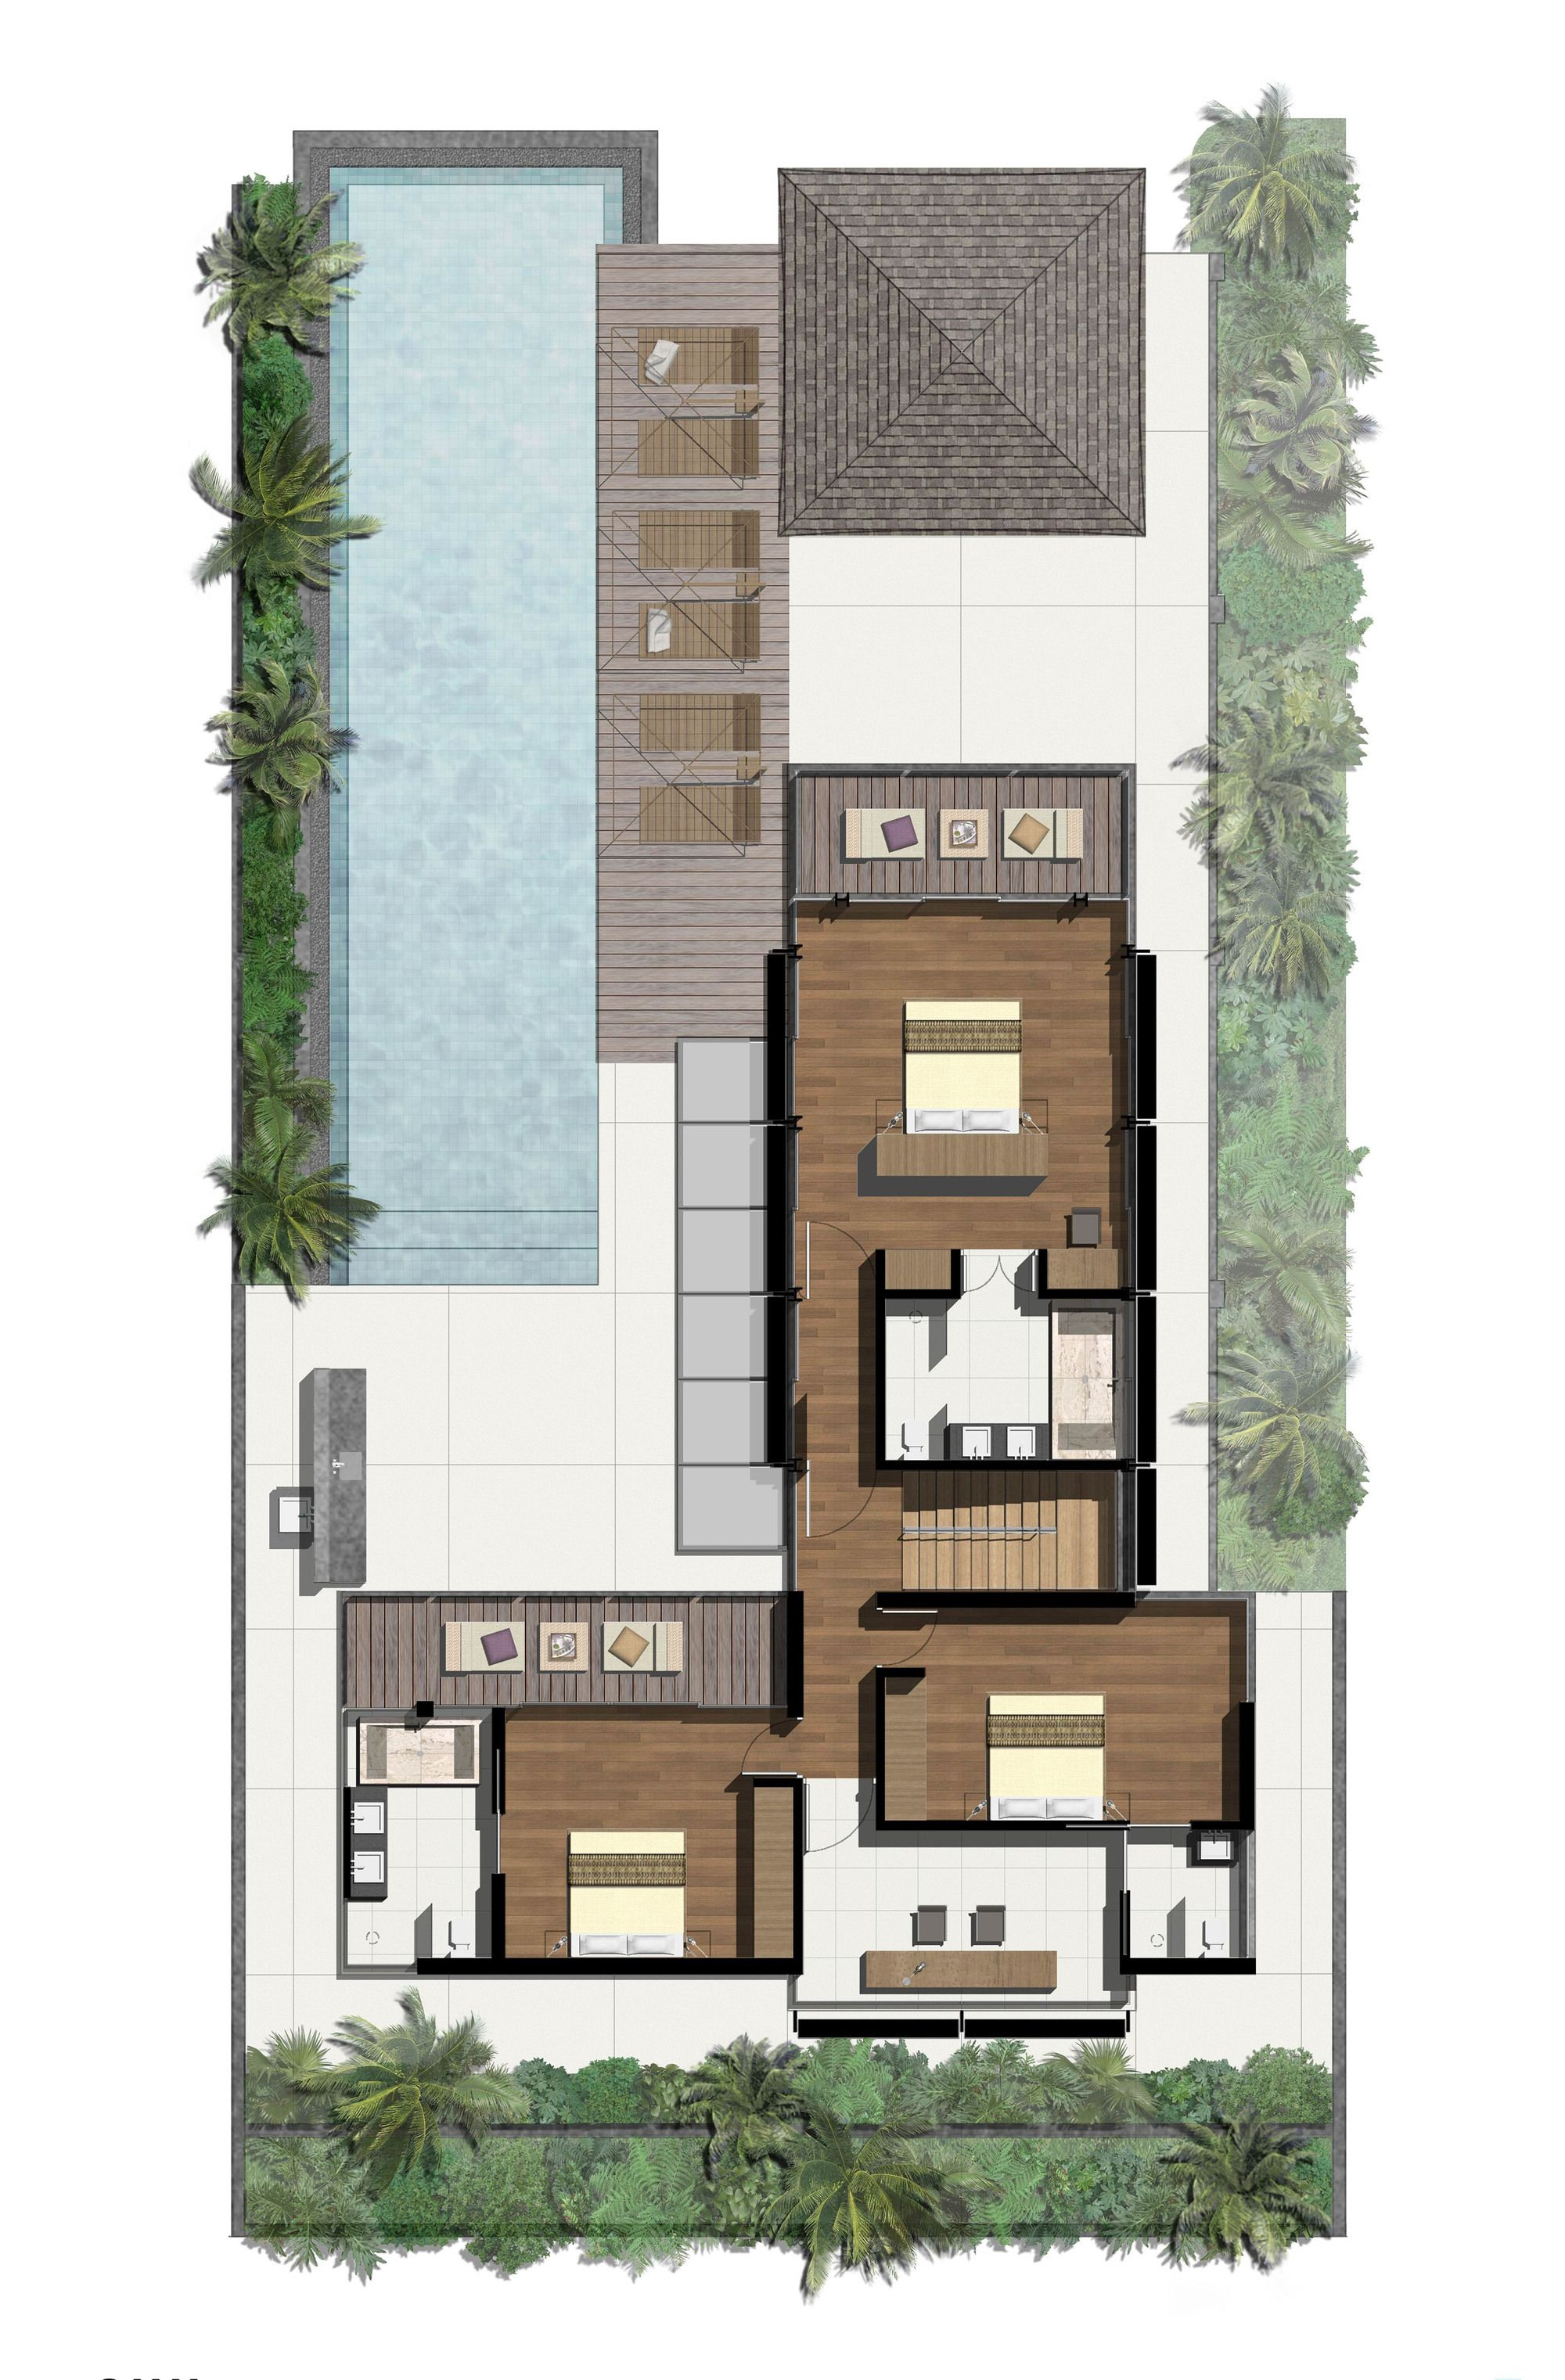 Image 25 of 25 from gallery of SAVA / Original Vision. Floor Plan